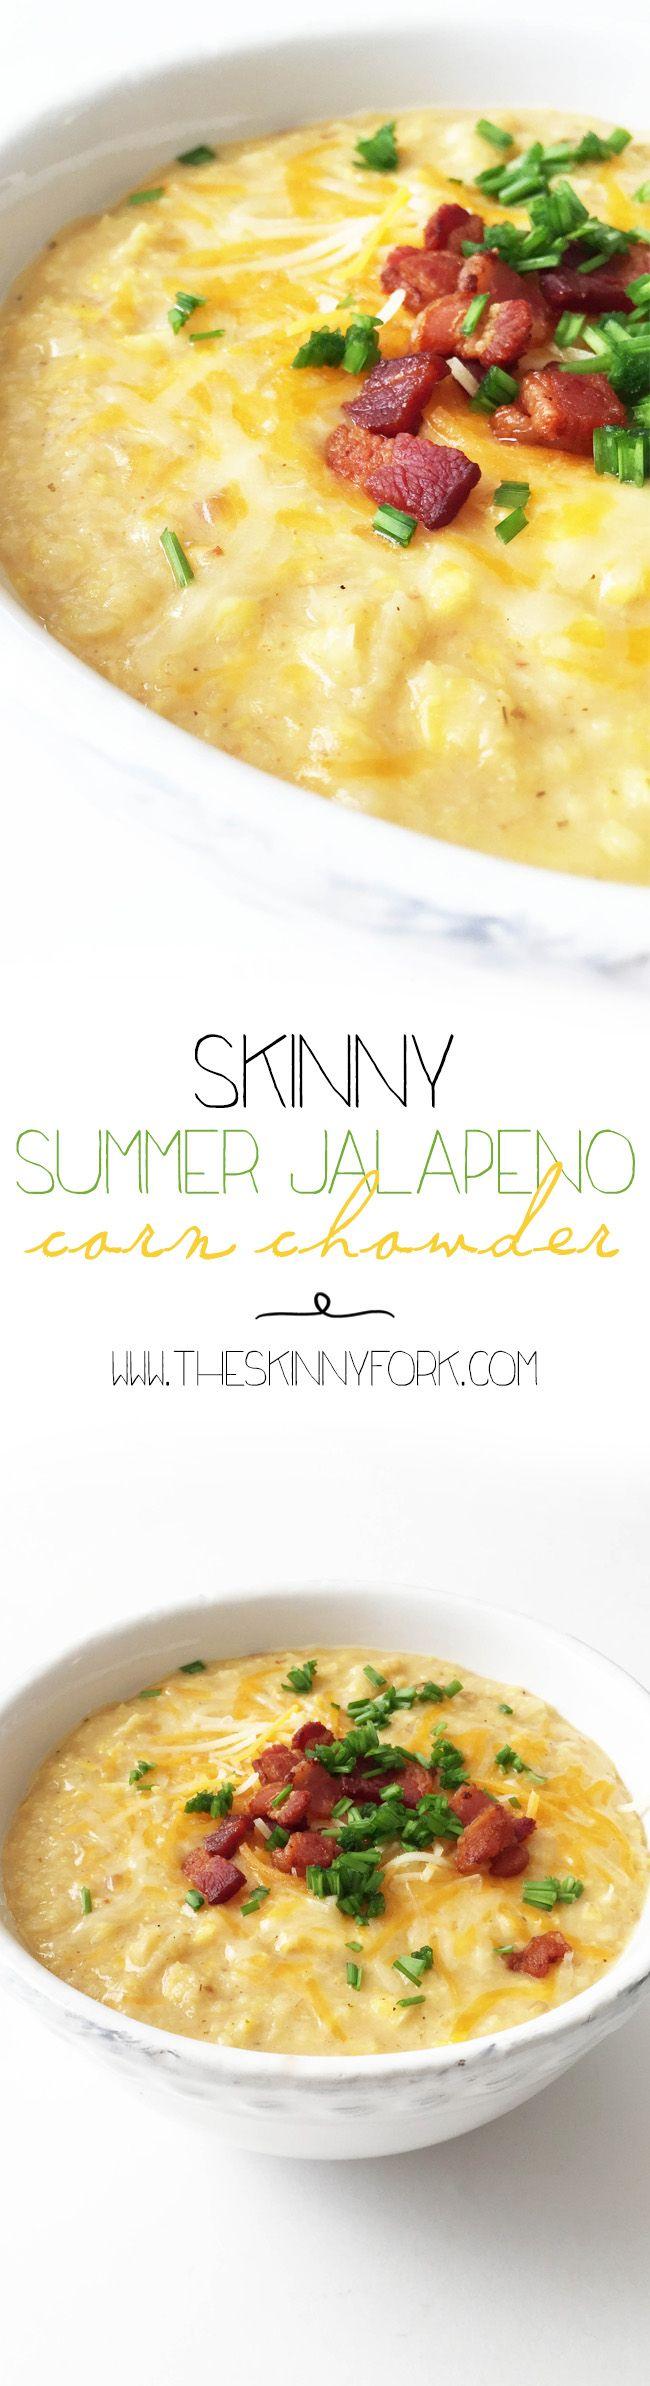 Skinny Summer Jalapeño Corn Chowder (Crock Pot) - Using up seasonal corn, potatoes, and chives in a lighter way! TheSkinnyFork.com